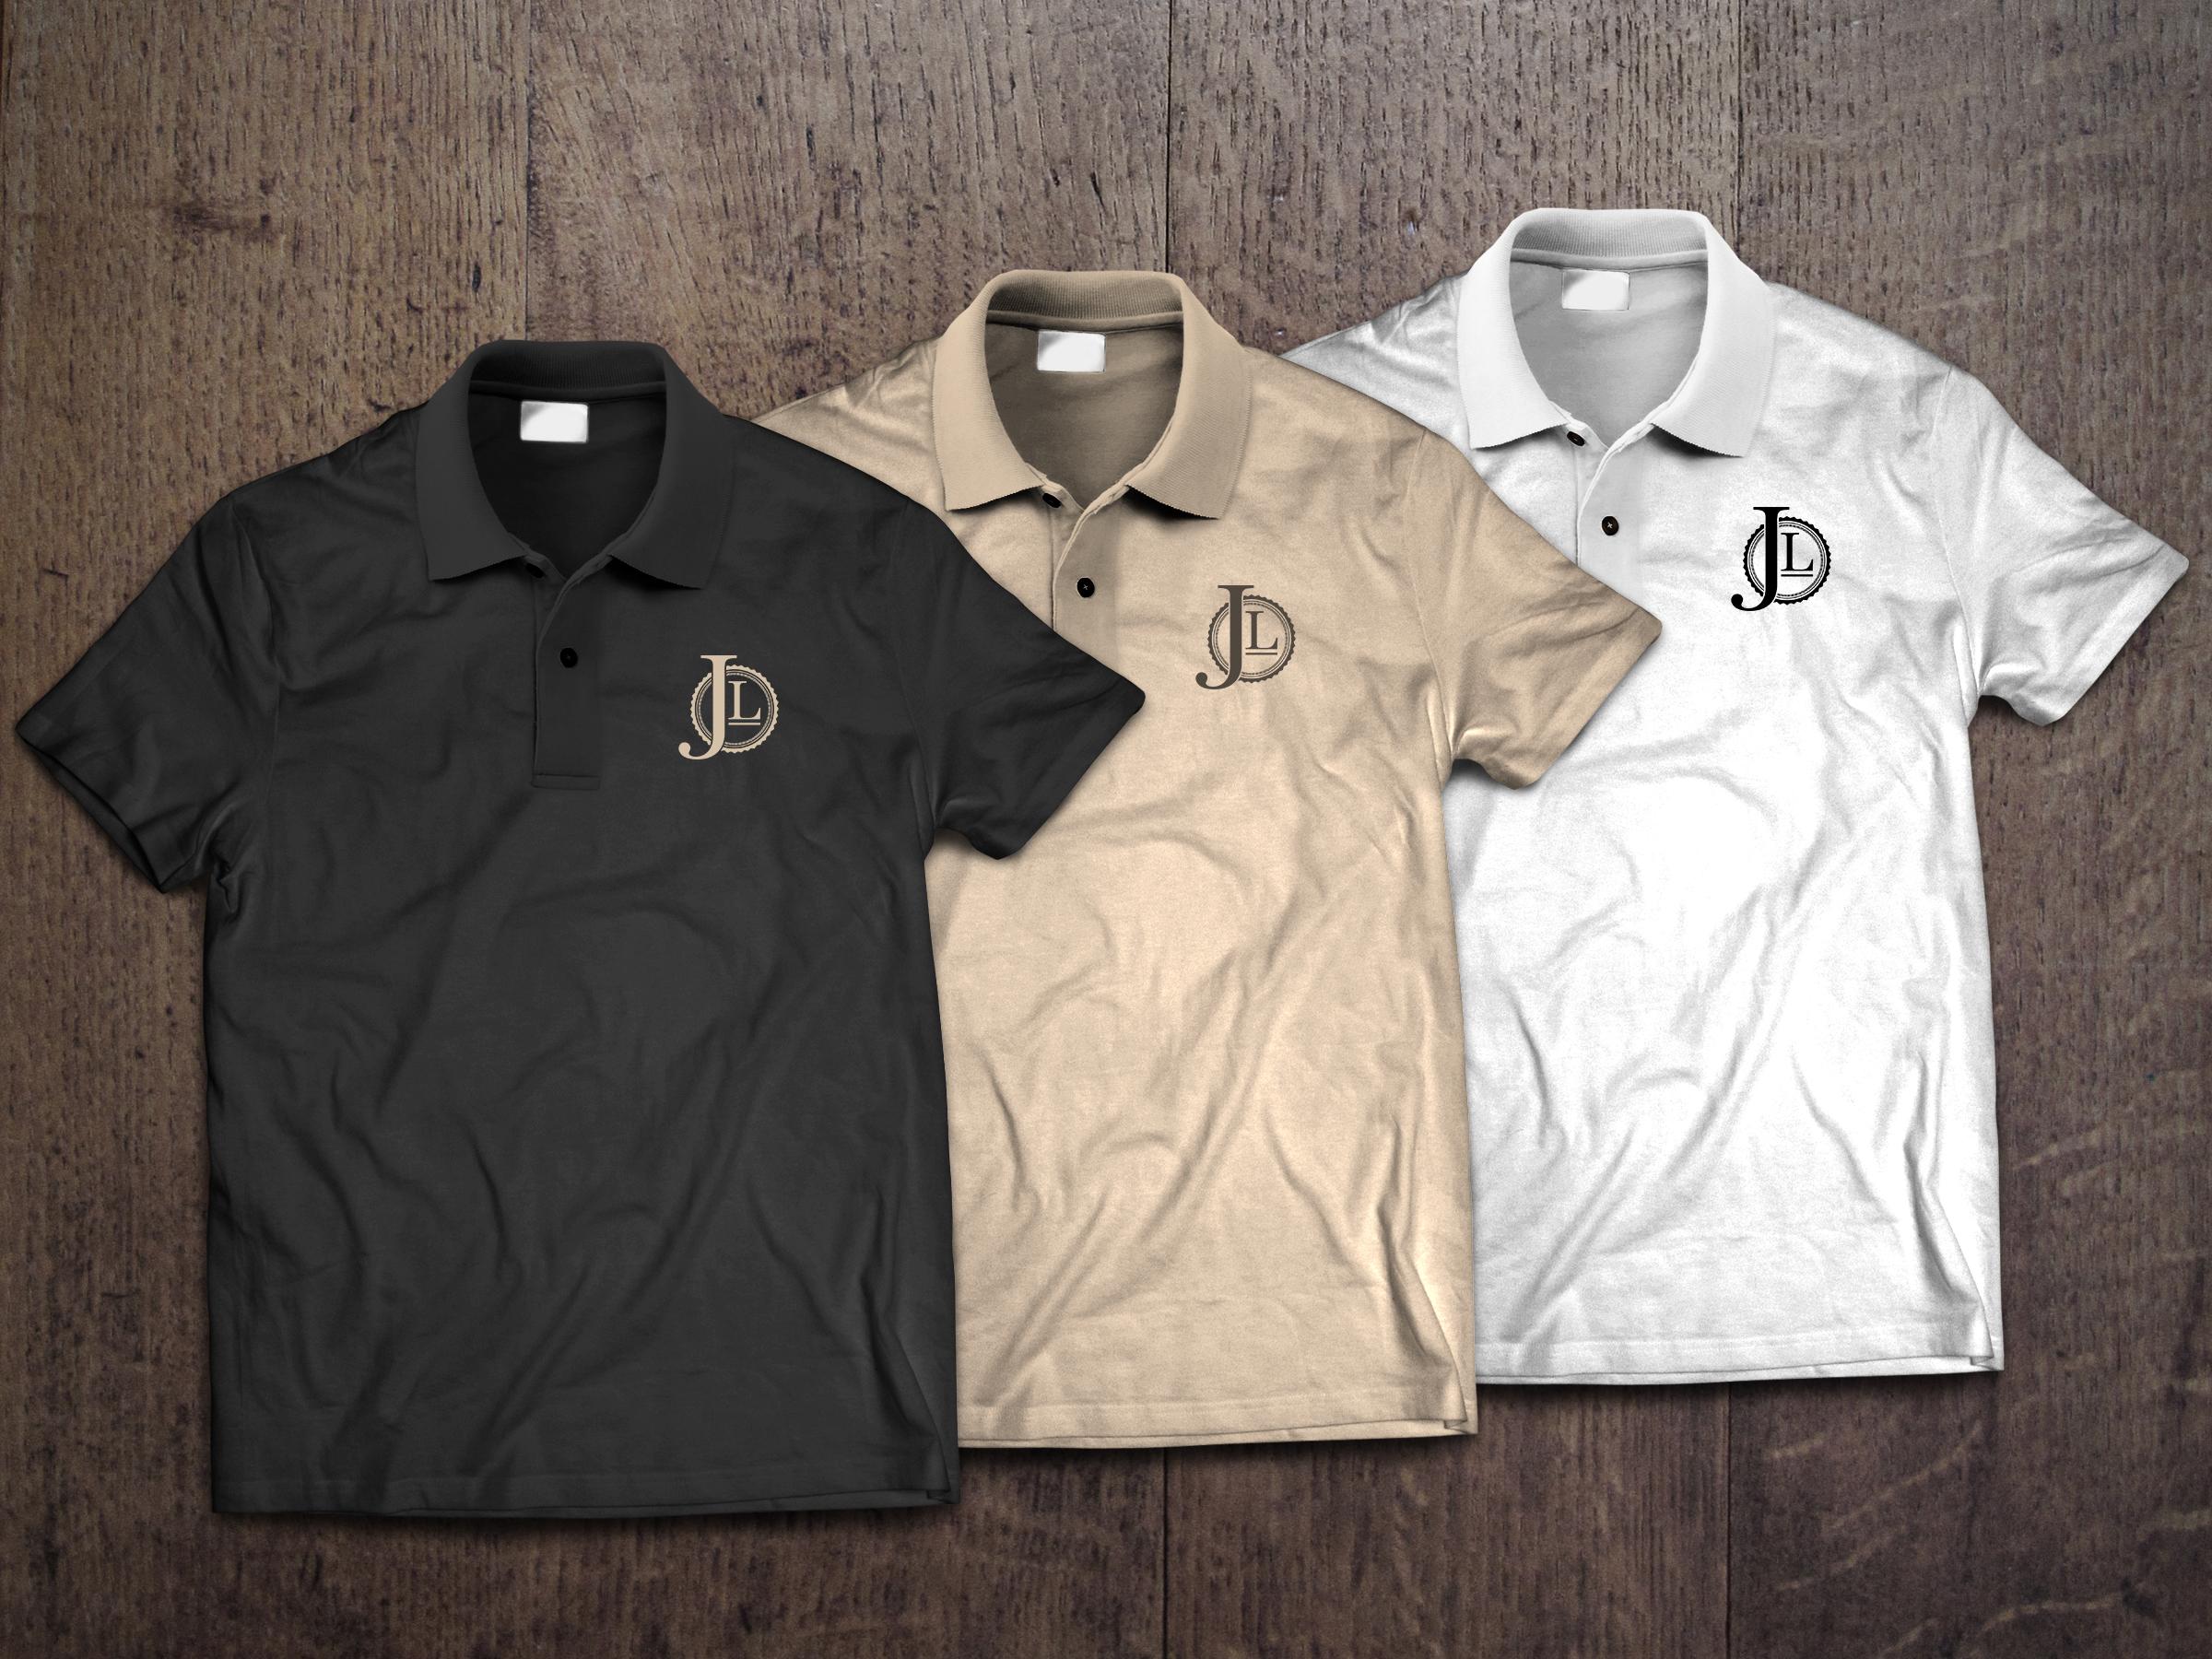 JL_BAR_polo_shirt.jpg